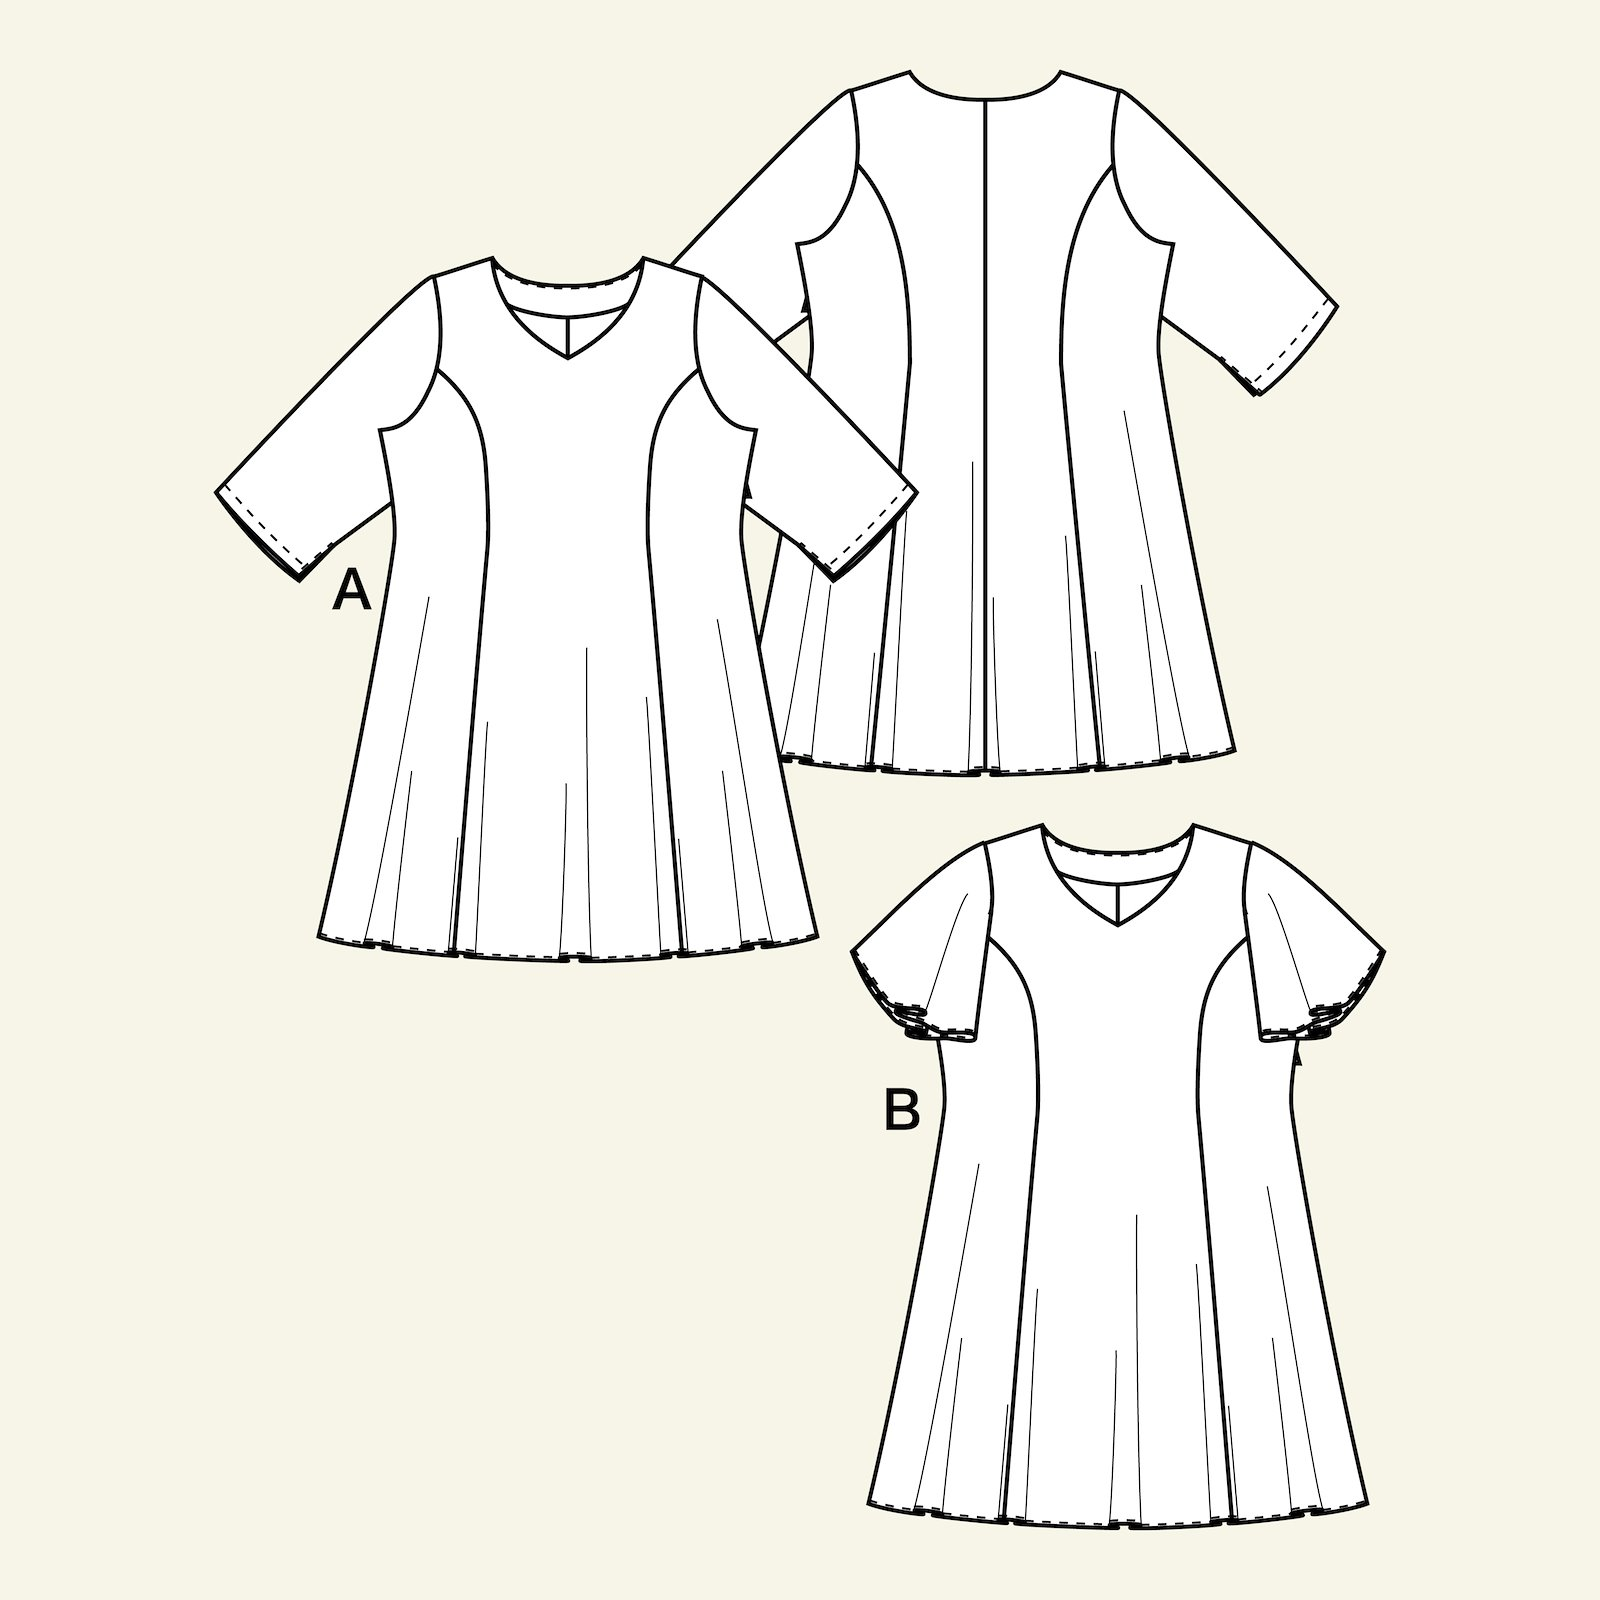 Dress with a princess cut, 50/22 p73016_pack